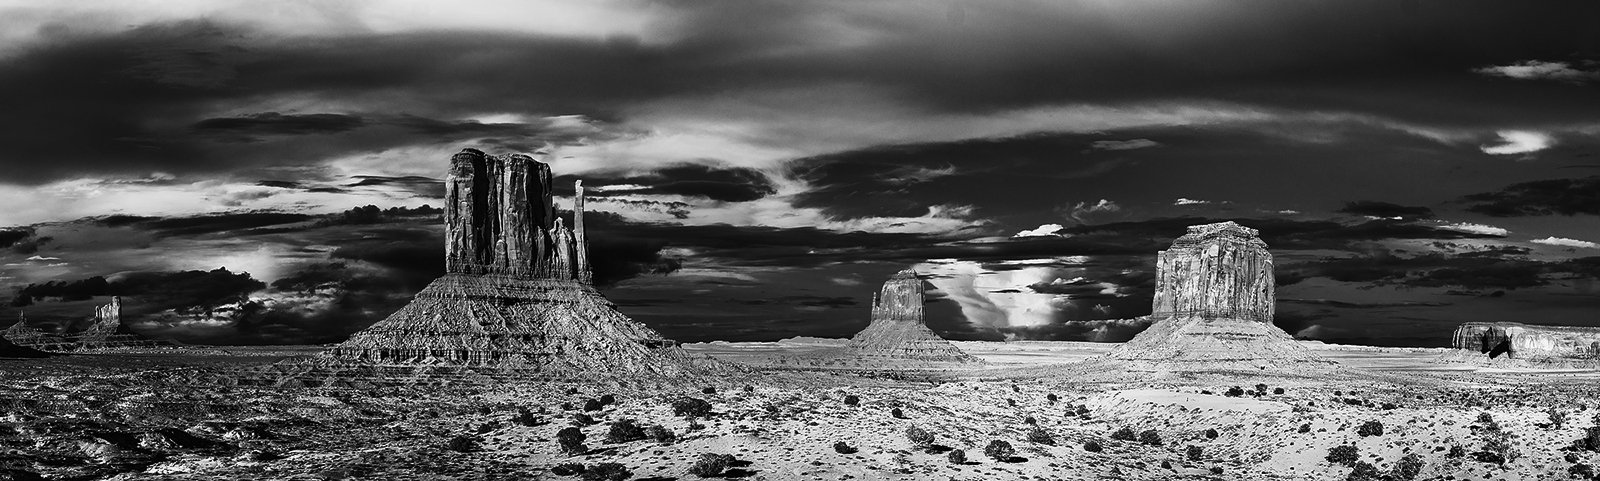 monument, valley, classic, view, Сергей Кузнецов